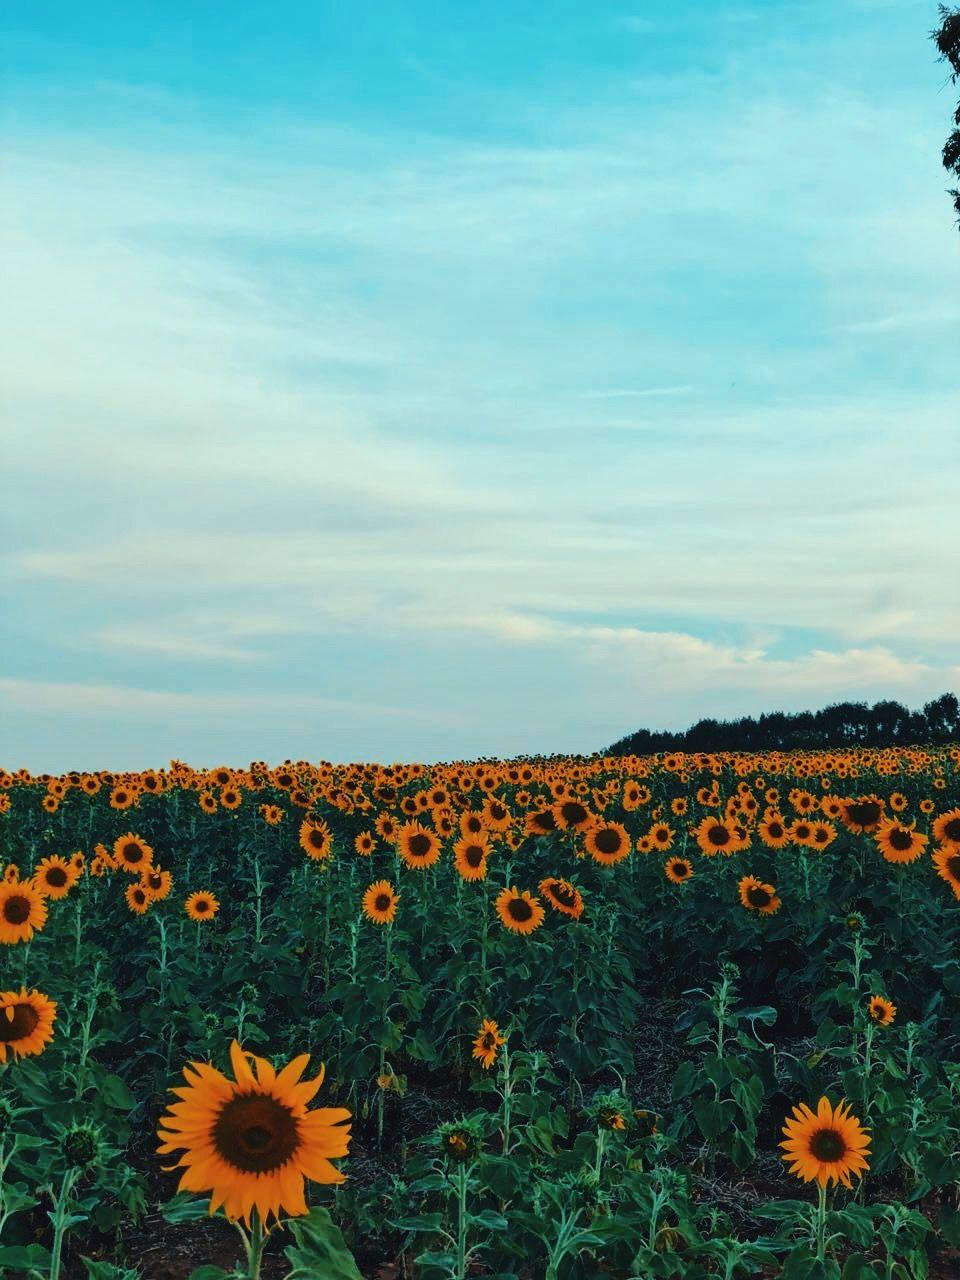 12june2019wednesday Nobody Cares Sunflower Wallpaper Beach Sunset Painting Apple Watch Wallpaper